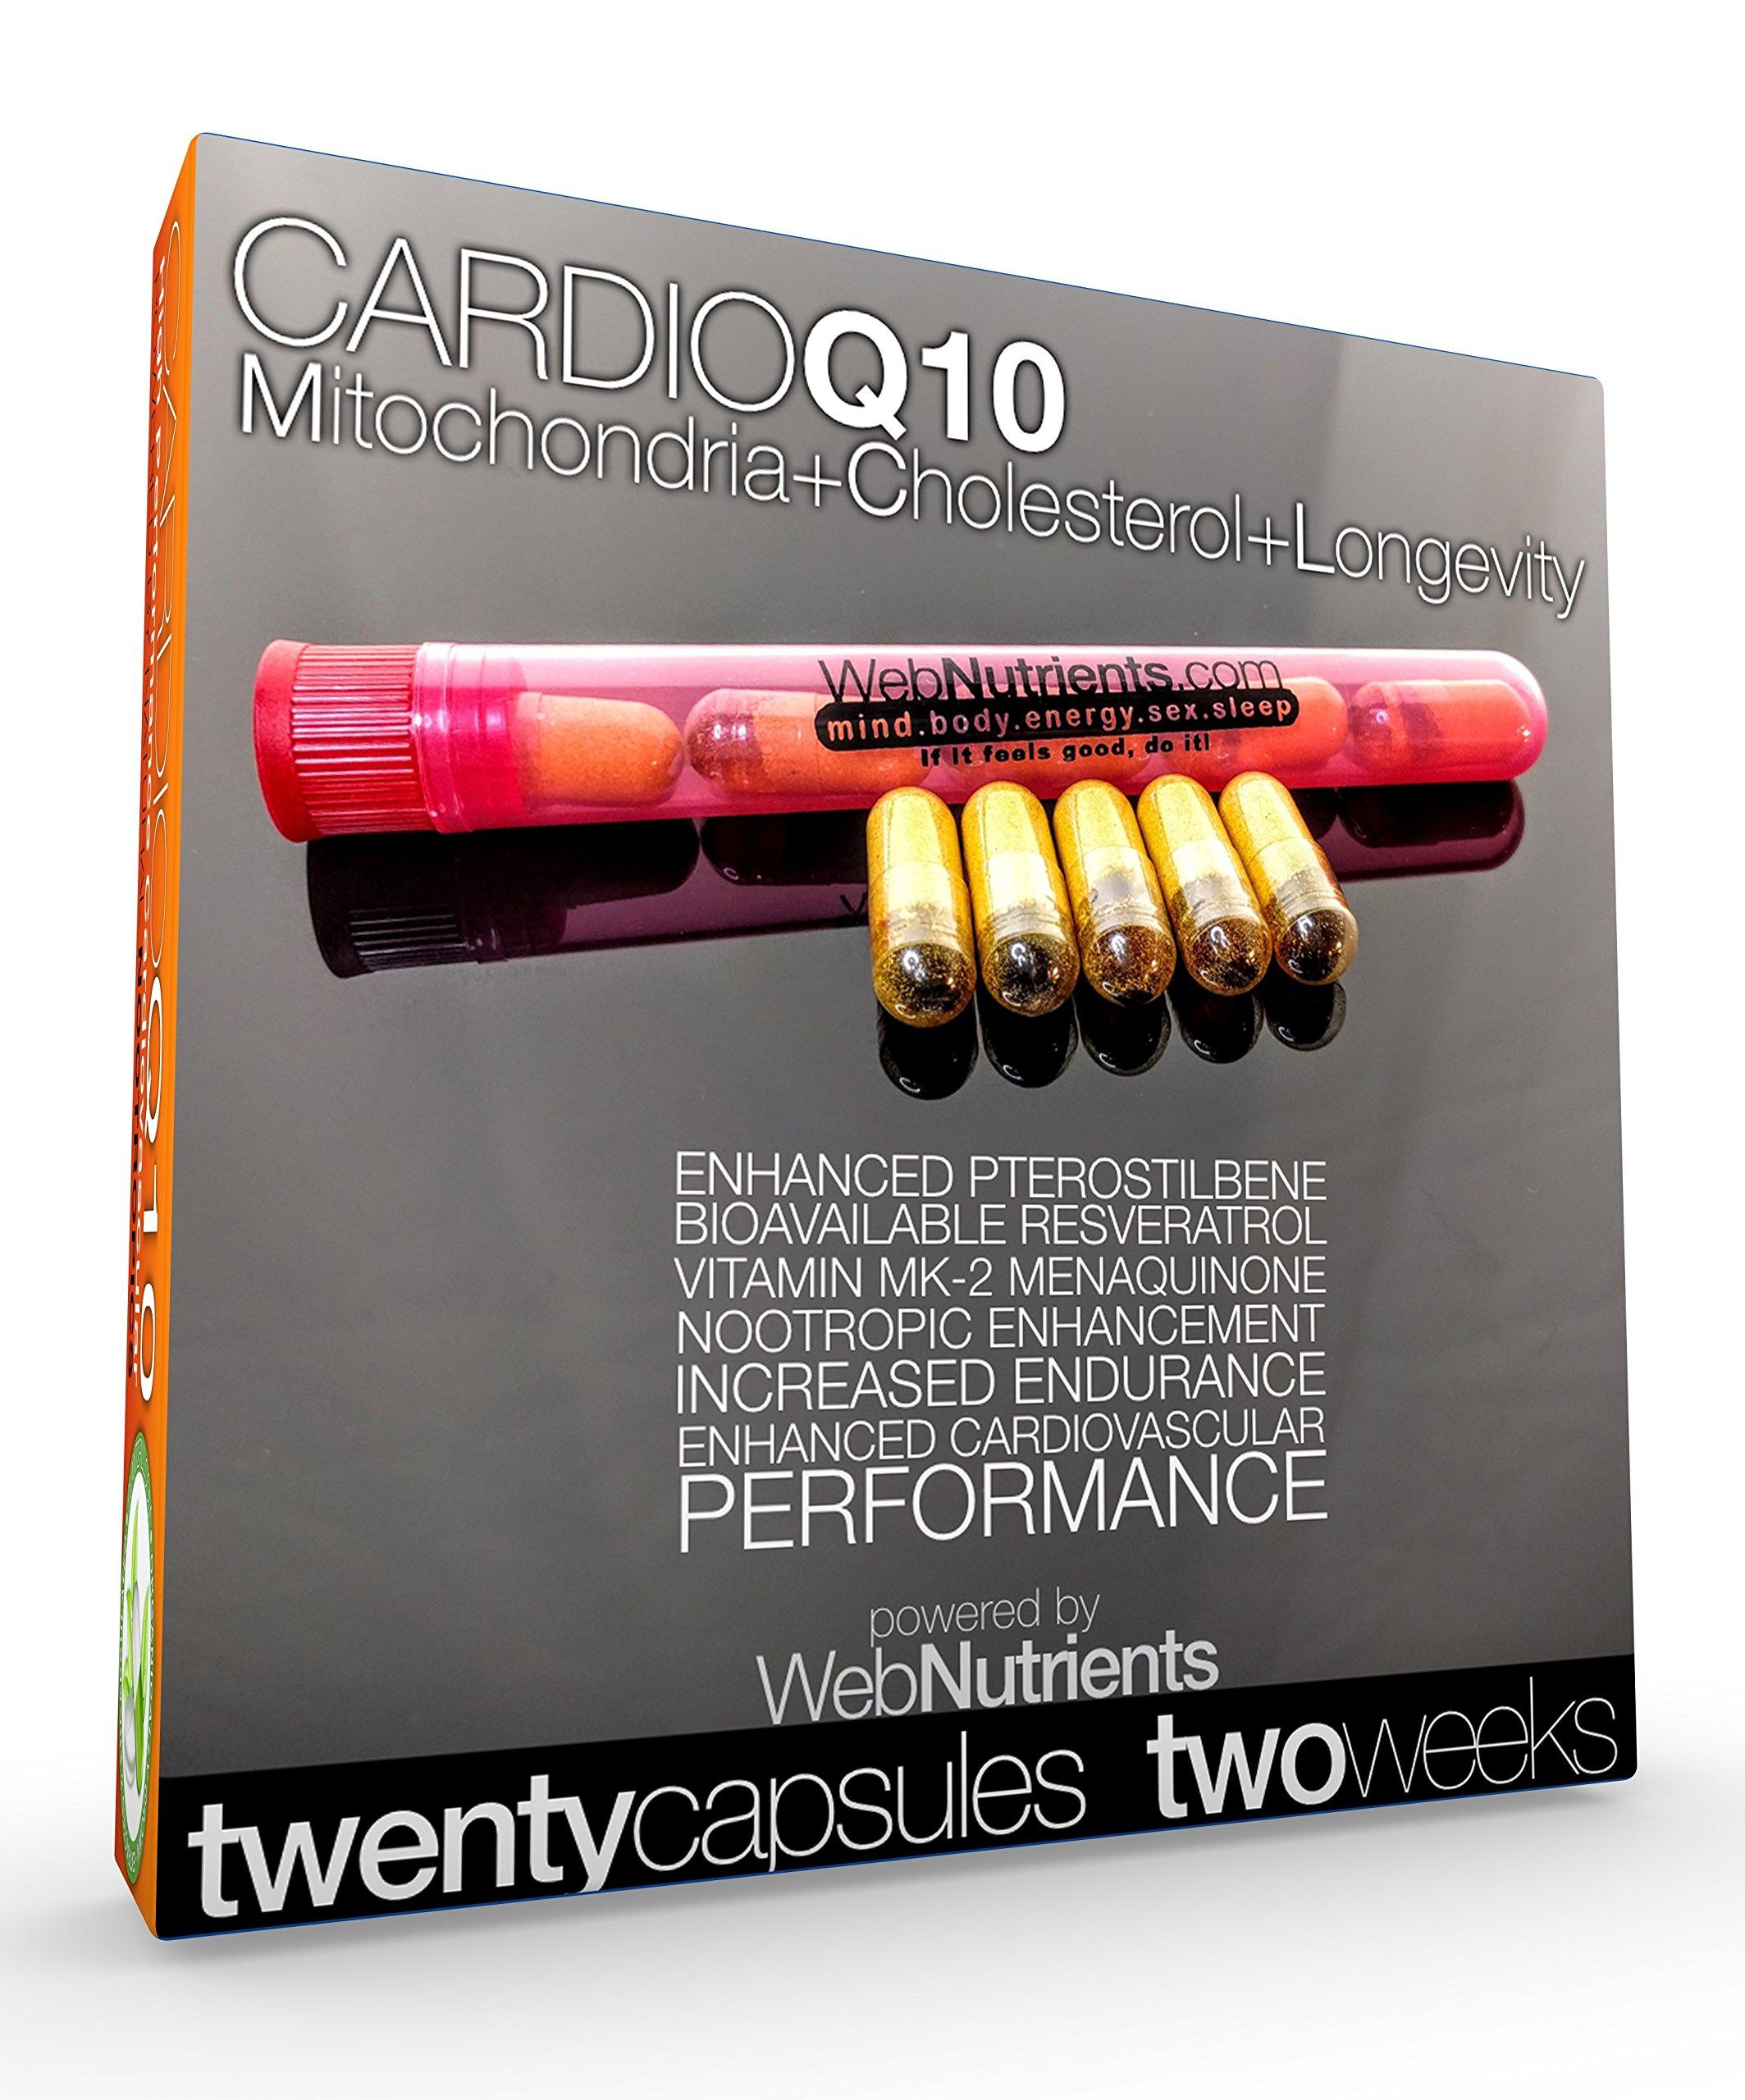 CardioCOQ10 - The AntiStatin - Improve Cardiovascular Performance. Manage Cholesterol Issues. Improve Hormone Levels. COQ10, Resveratrol, Vitamin MK2, Curcumin, Piperine, More.